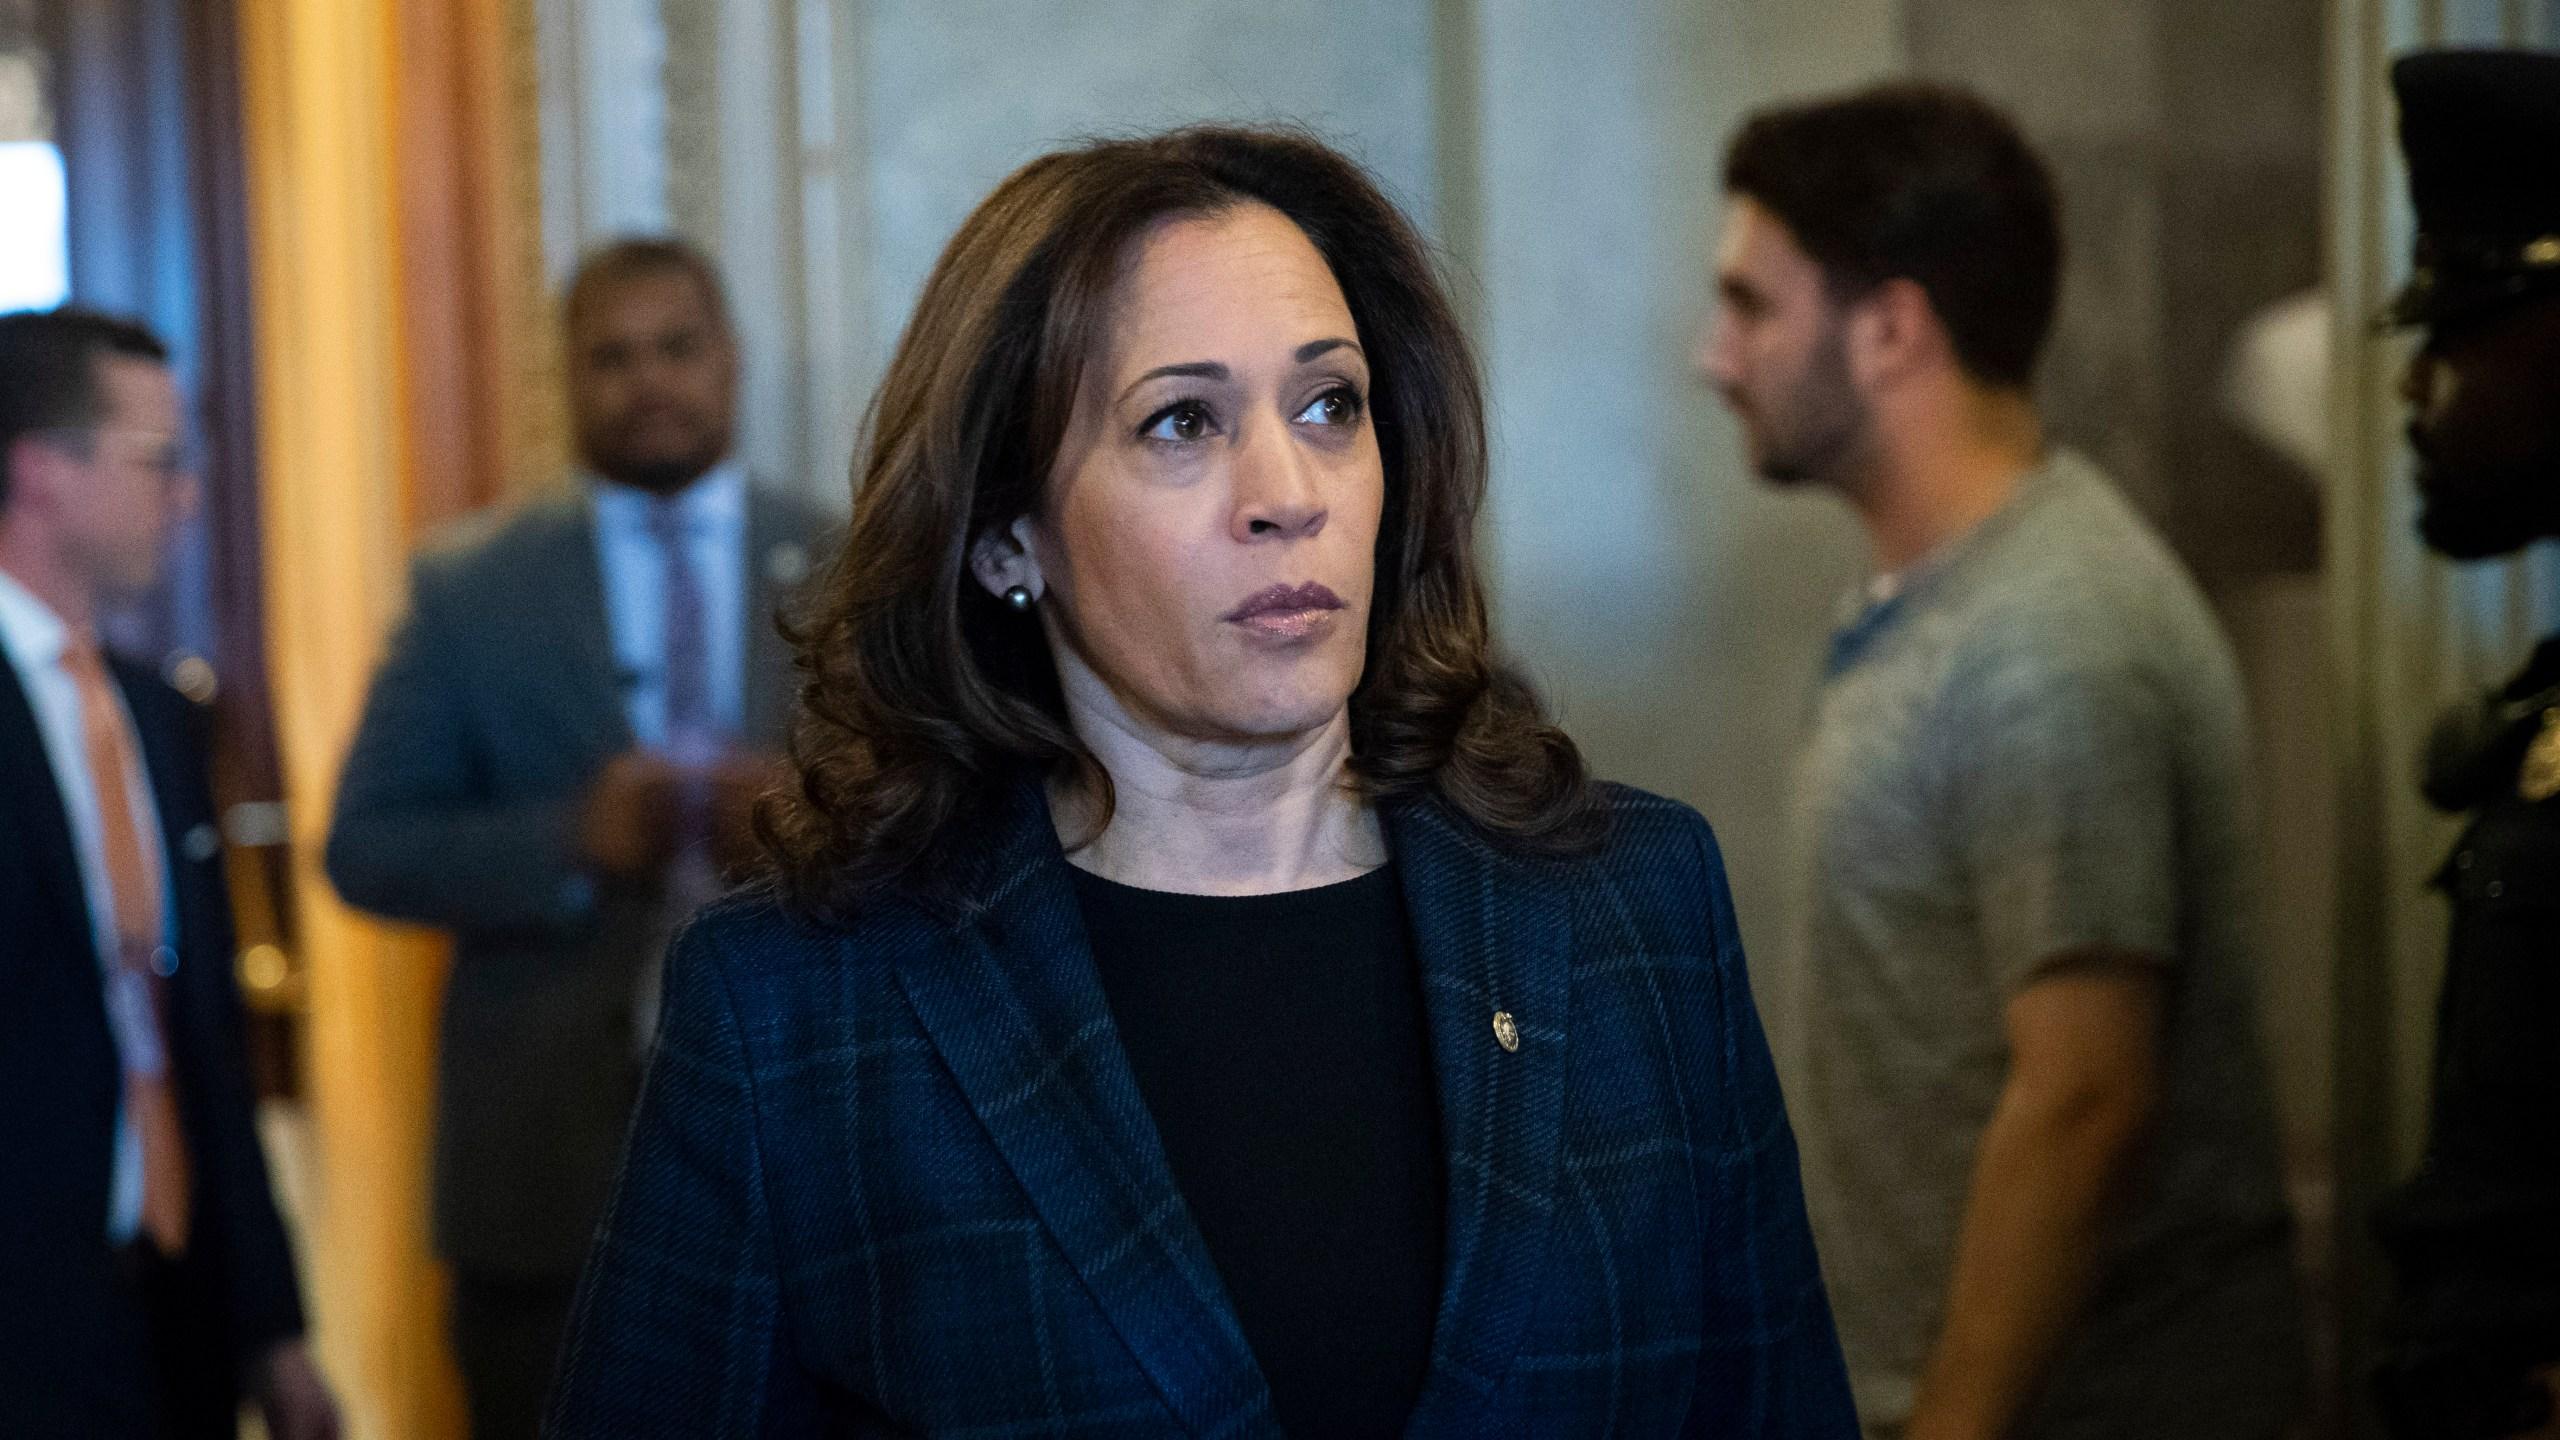 Sen Kamala Harris Visiting Iowa Ahead Of Midterm Elections